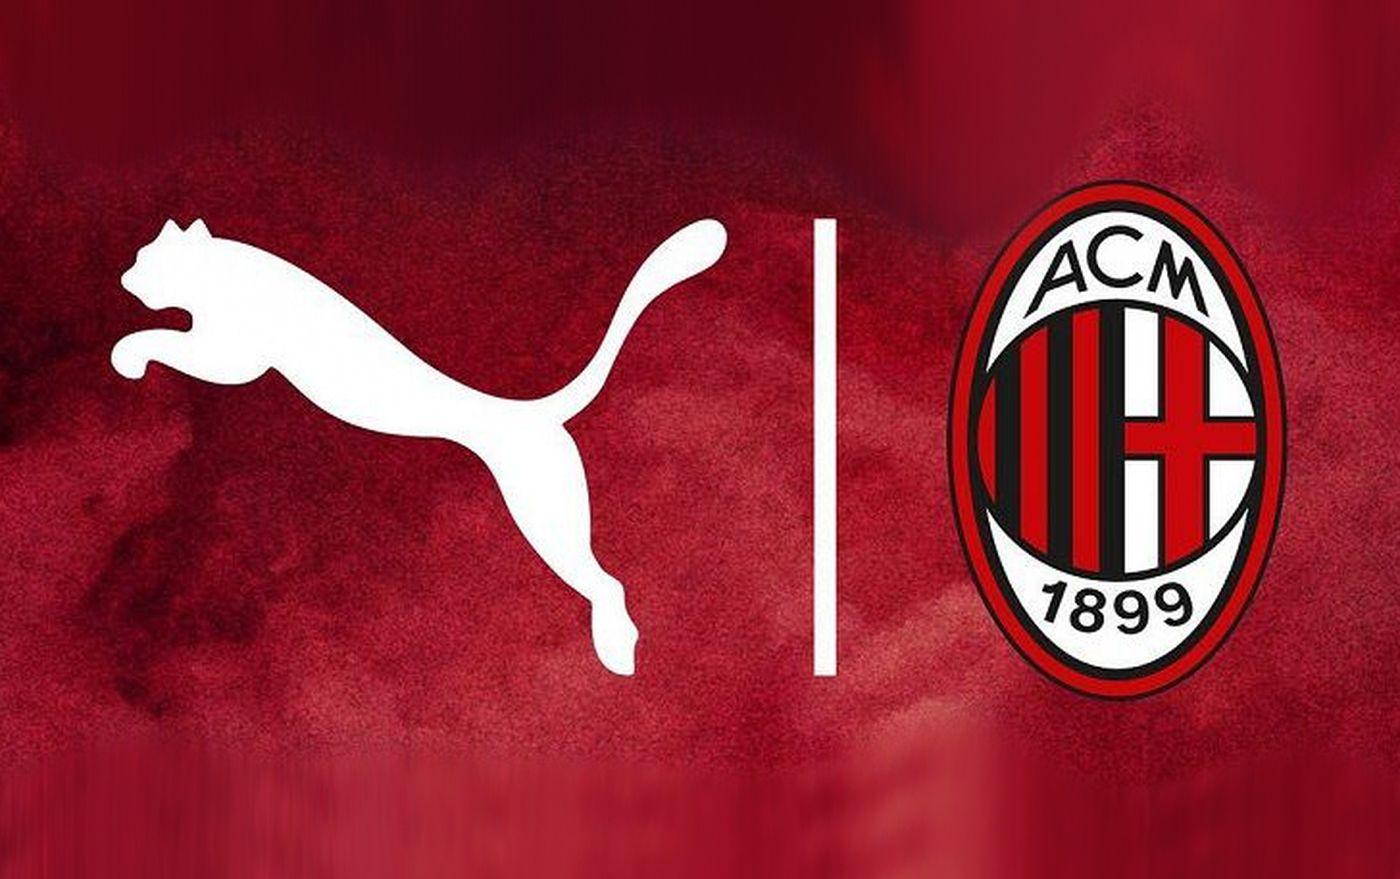 Gallery Ac Milan S Vibrant Blue Puma Third Kit For 2020 21 Season Leaked